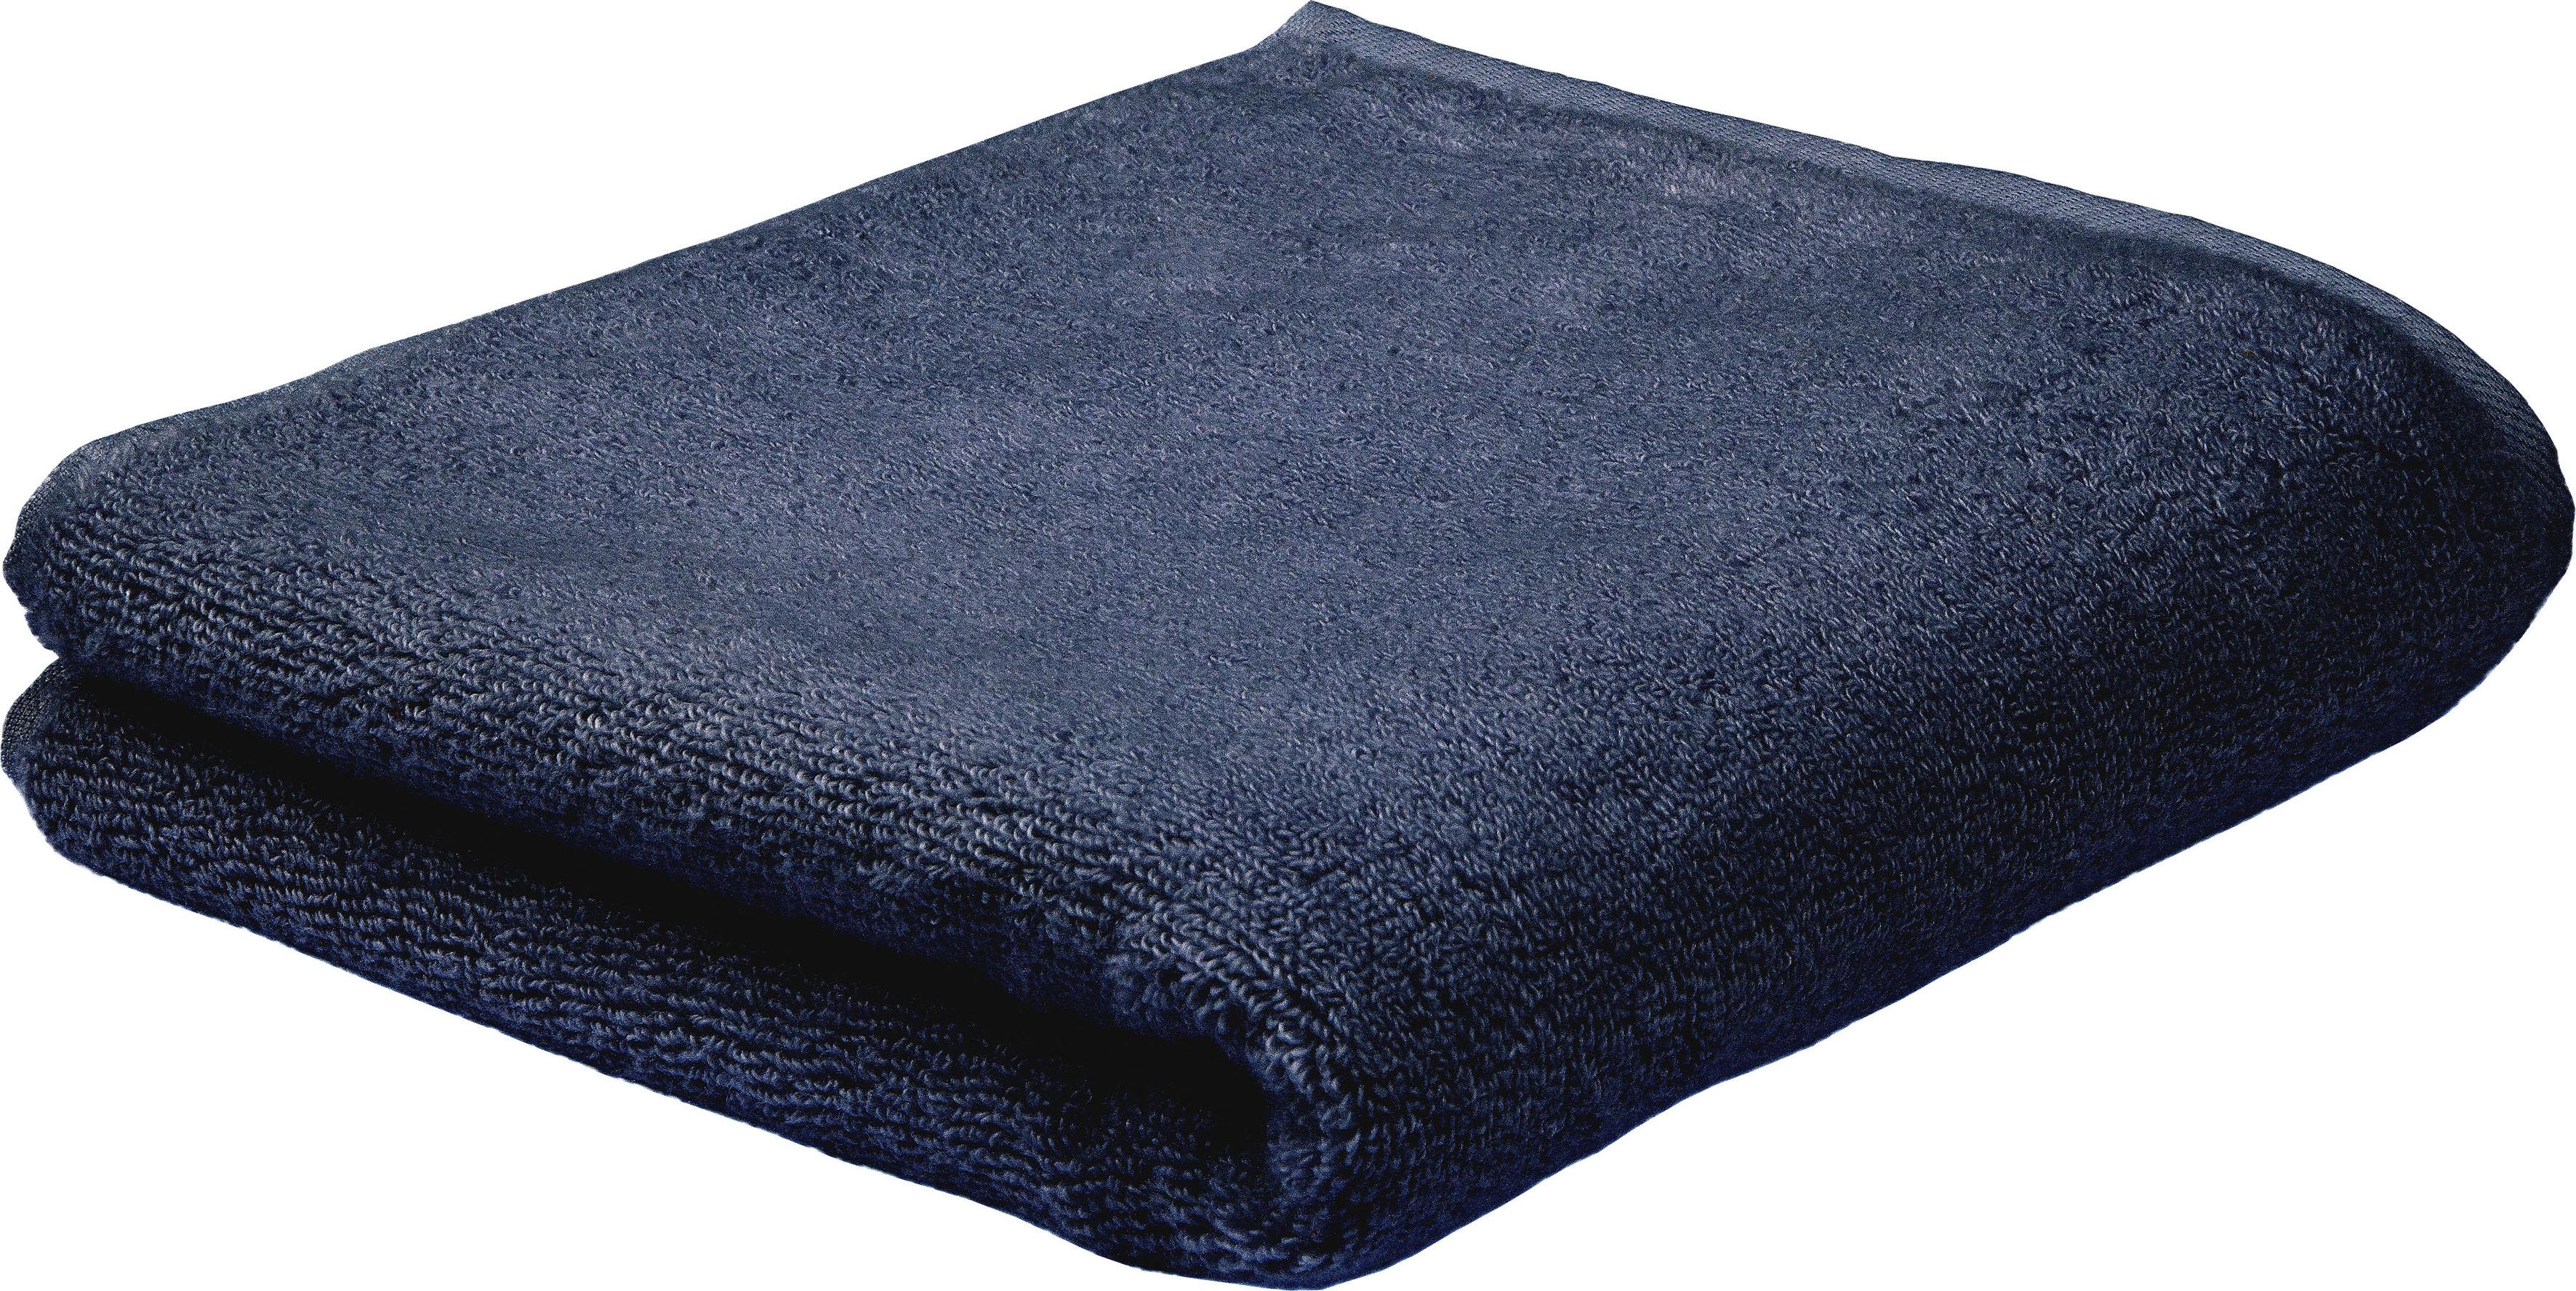 ROSS Handtuch Sensual Skin, (2 St.), mit Aloe Vera veredelt blau Handtücher Badetücher